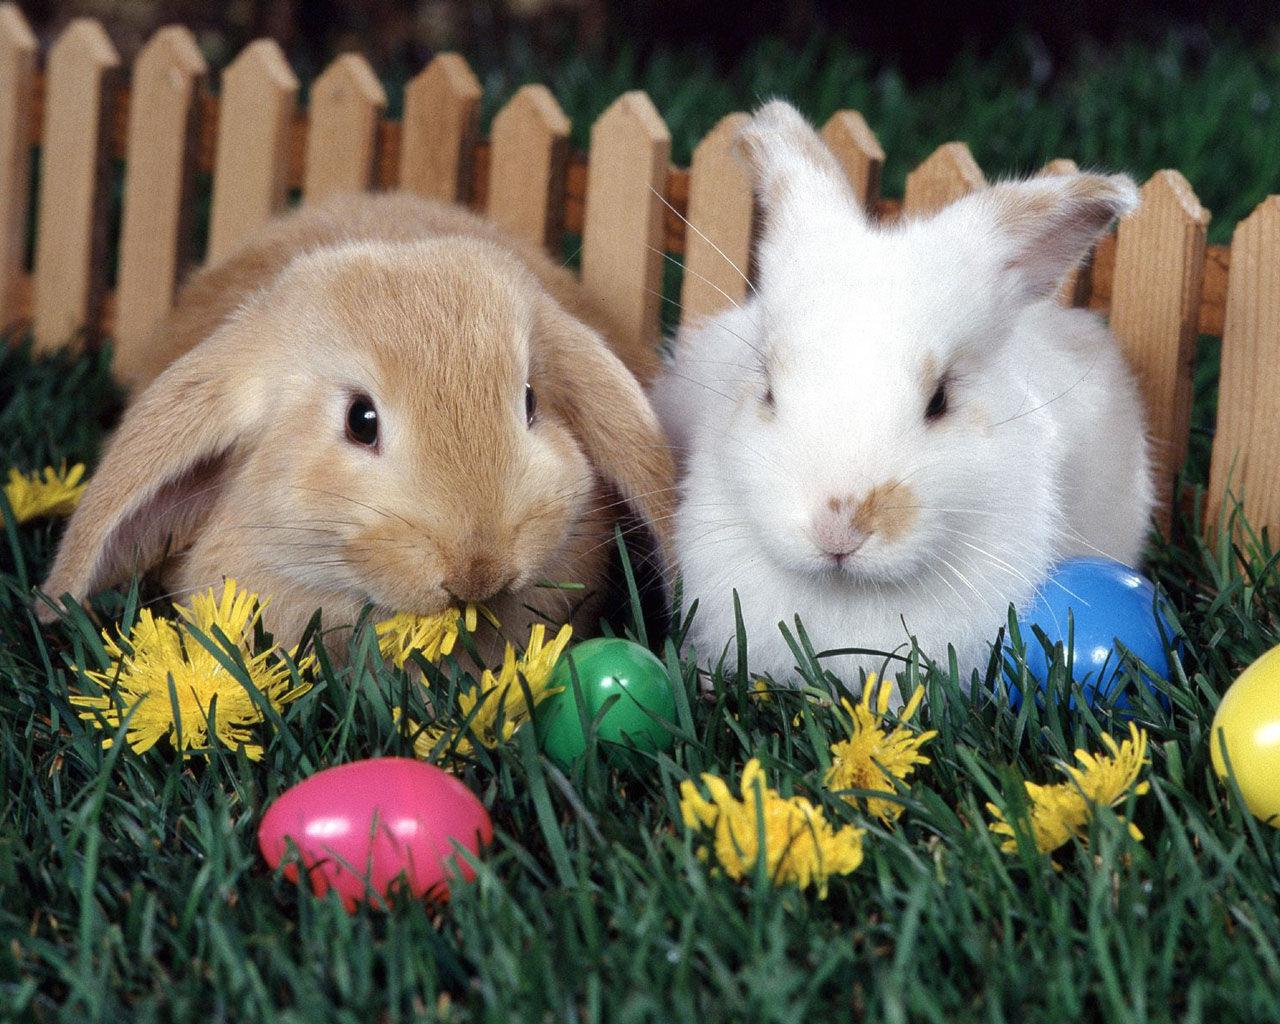 http://4.bp.blogspot.com/_h0GJRWHUFZw/TS9ksGK6SQI/AAAAAAAABIA/4k9pODXDvtg/s1600/2-Rabbits-bunny-rabbits-4233951-1280-1024.jpg